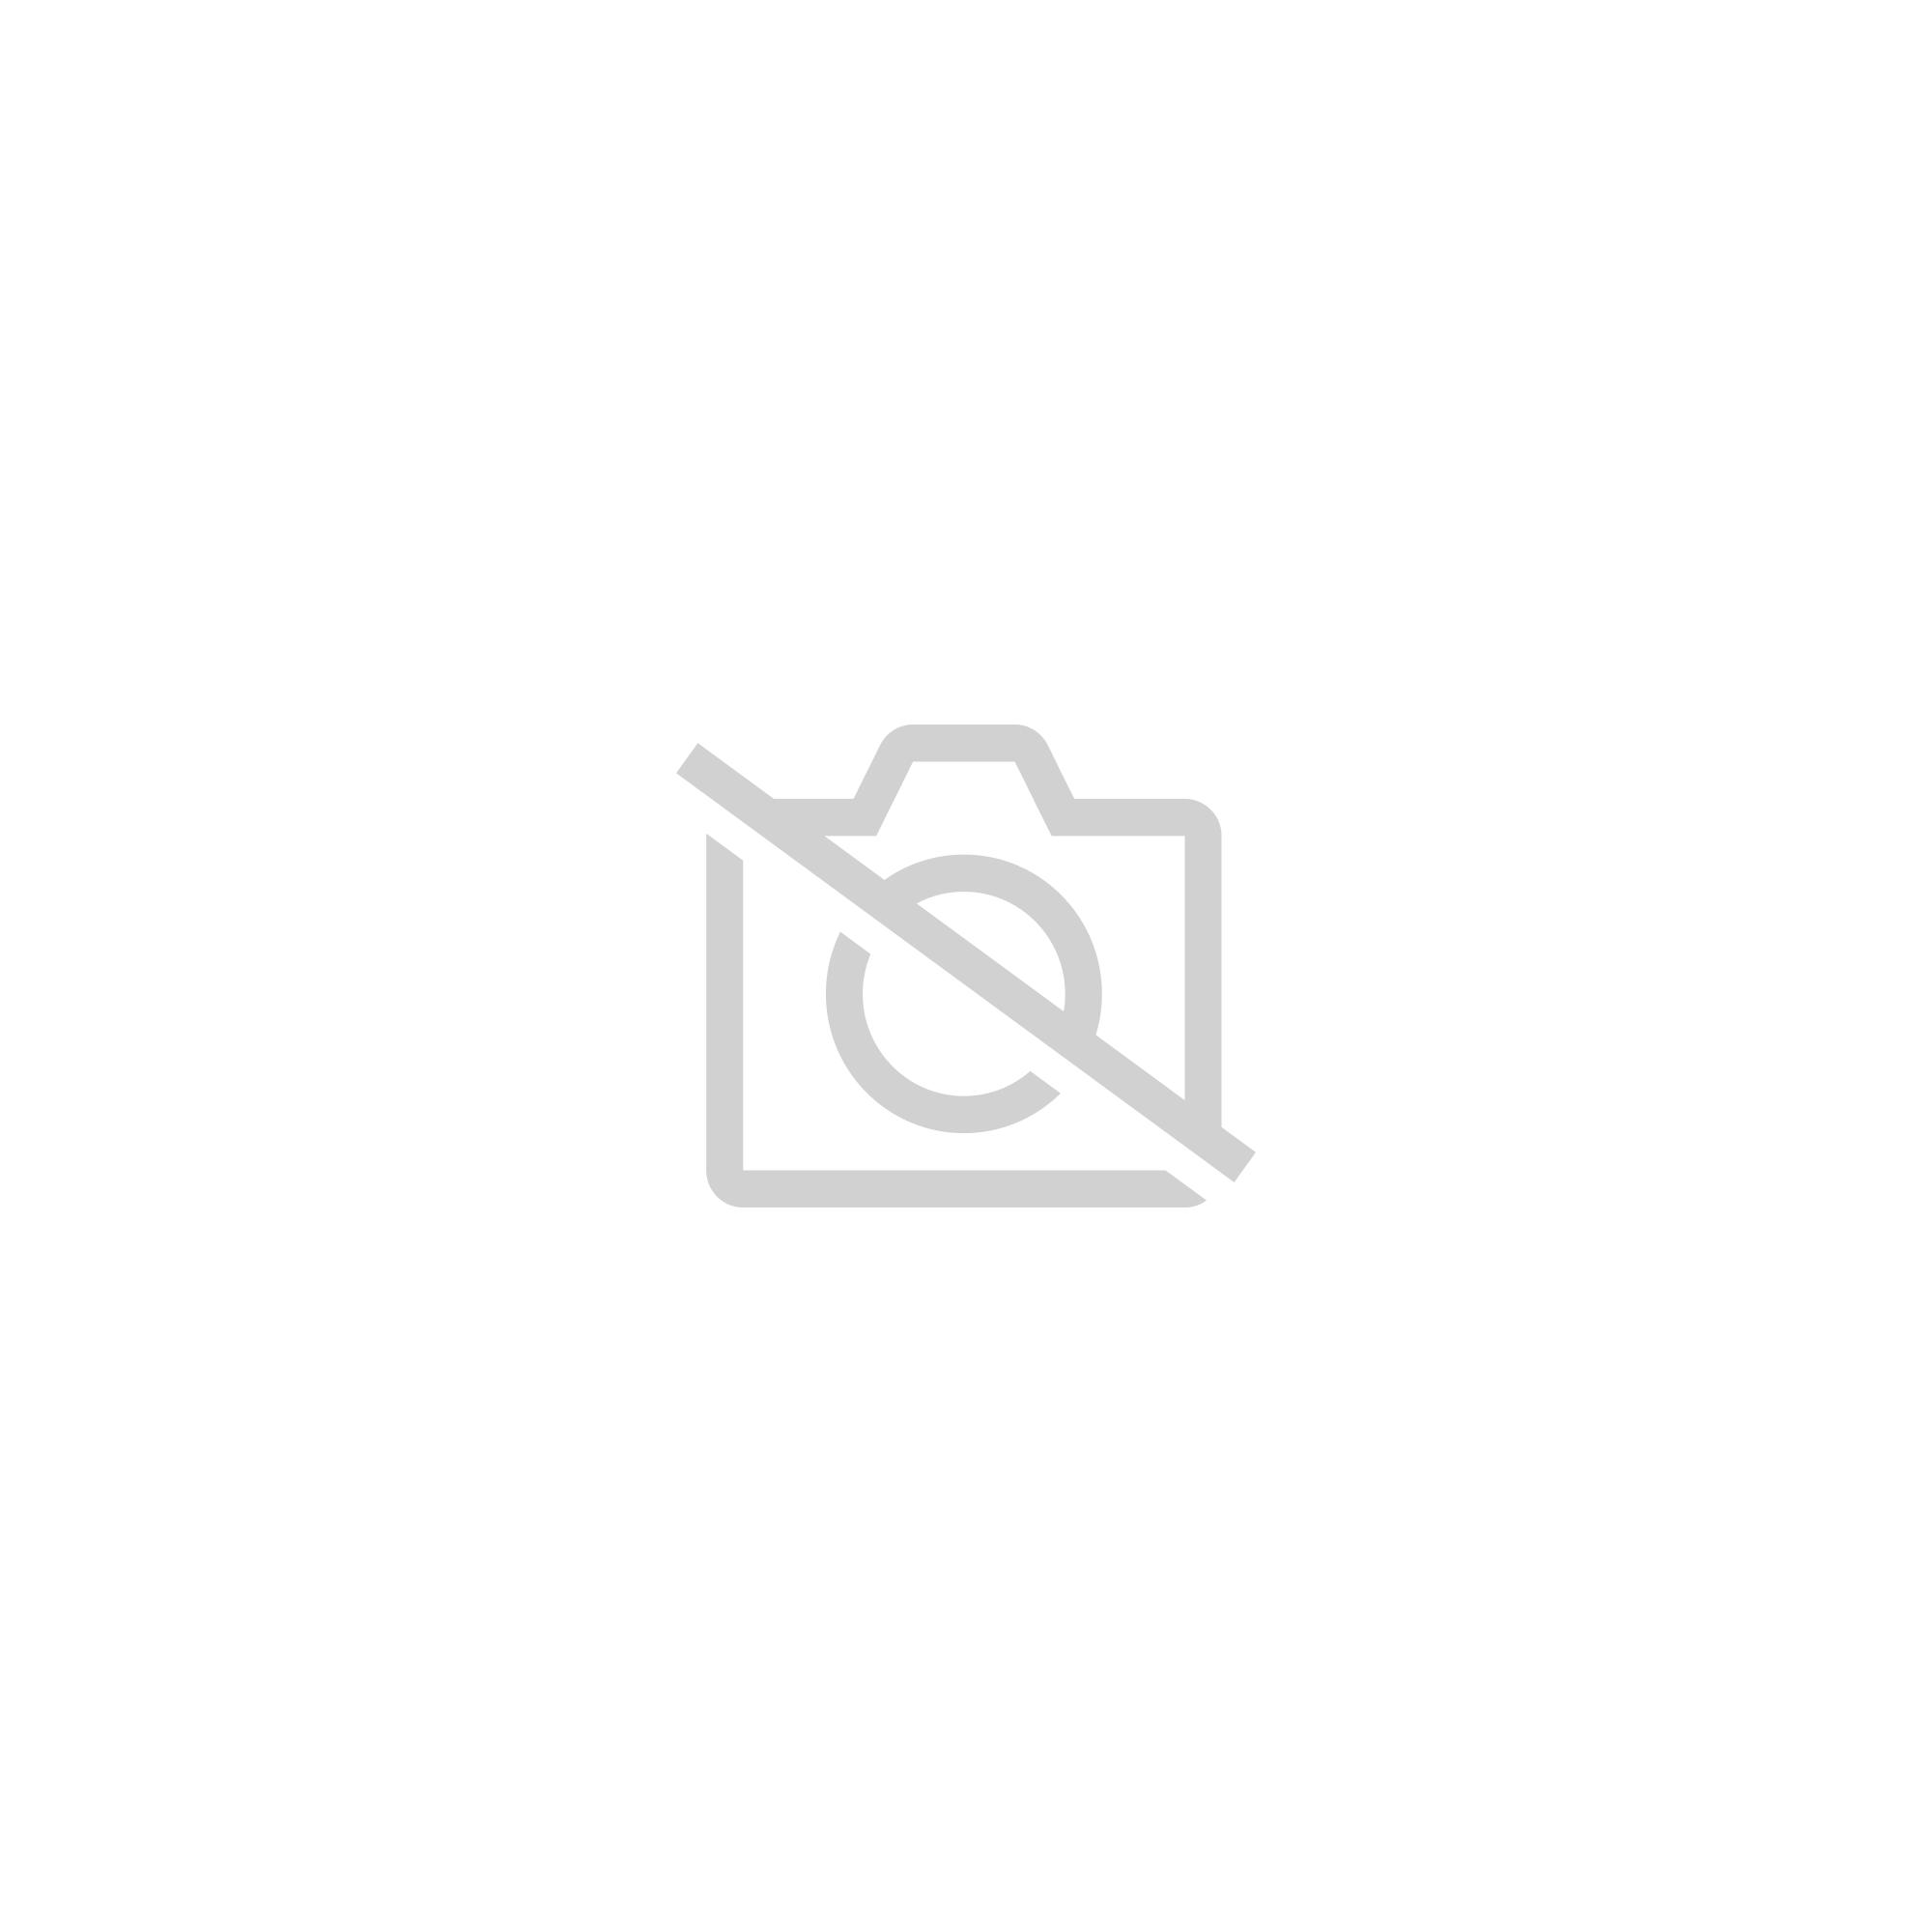 Adobe Framemaker - (Version 7.0 ) - Ensemble Complet - 1 Utilisateur - Cd - Win - Anglais